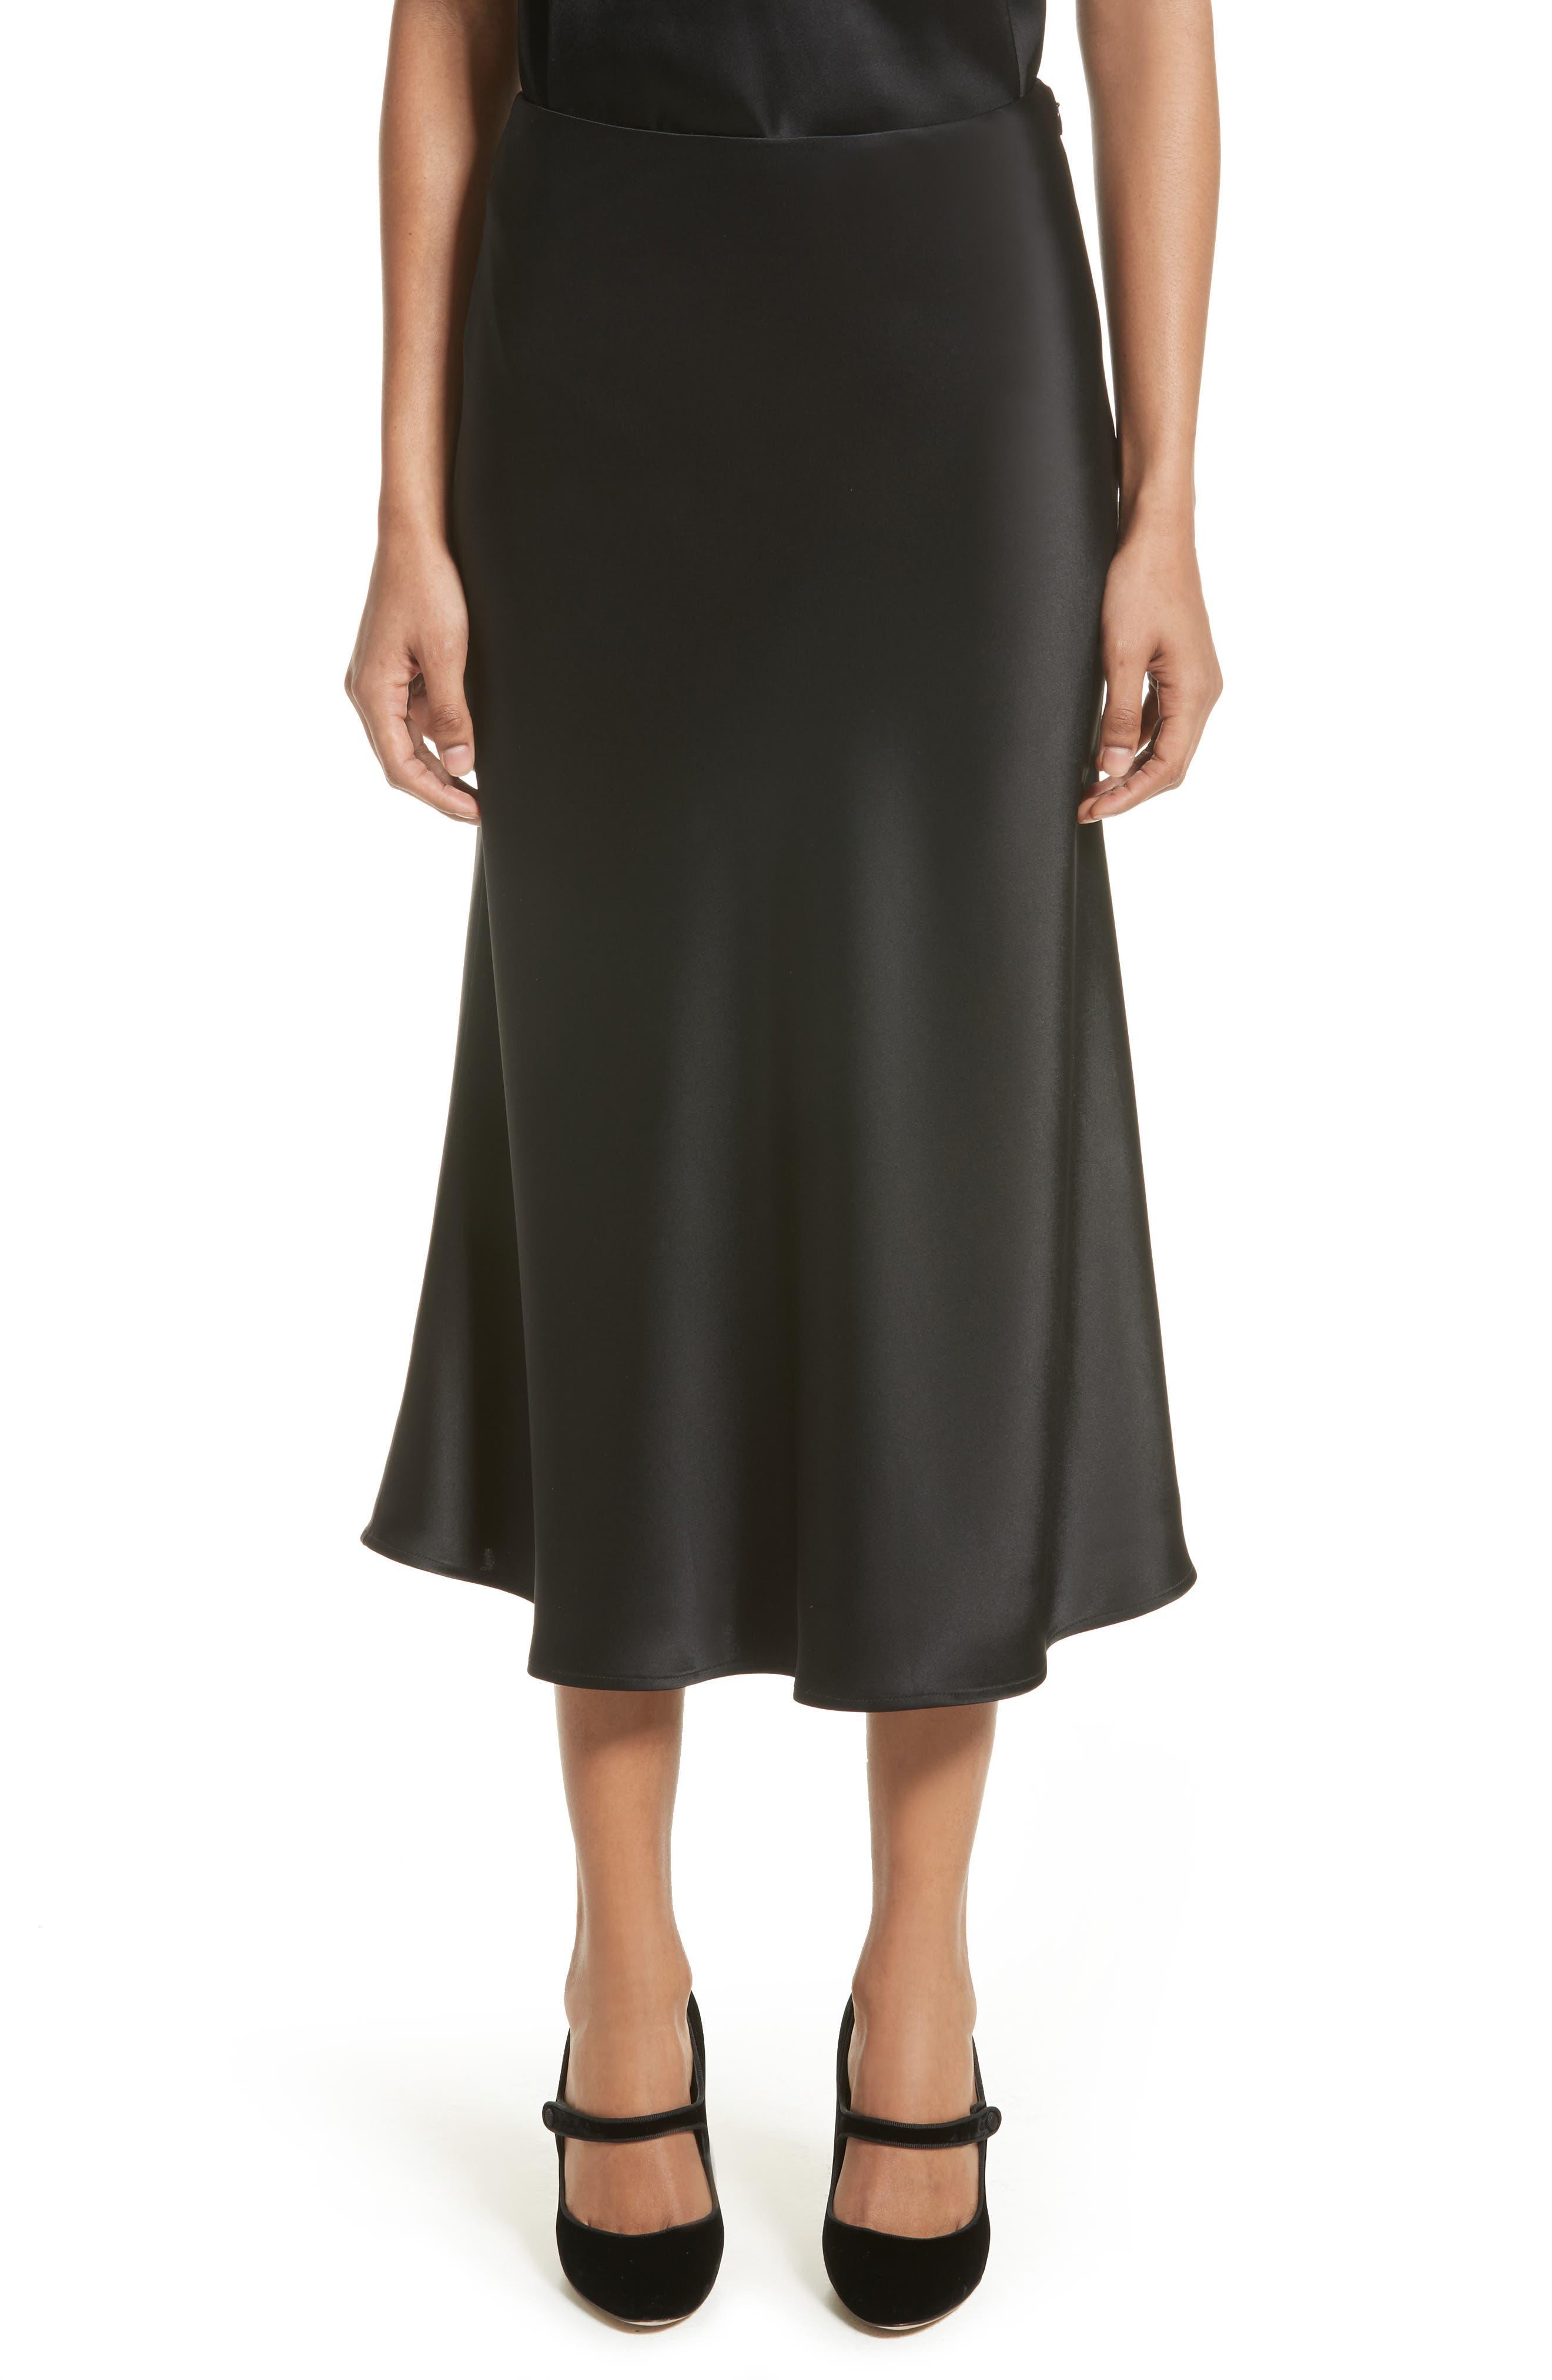 St. John Collection Bias Cut Liquid Satin Flared Skirt